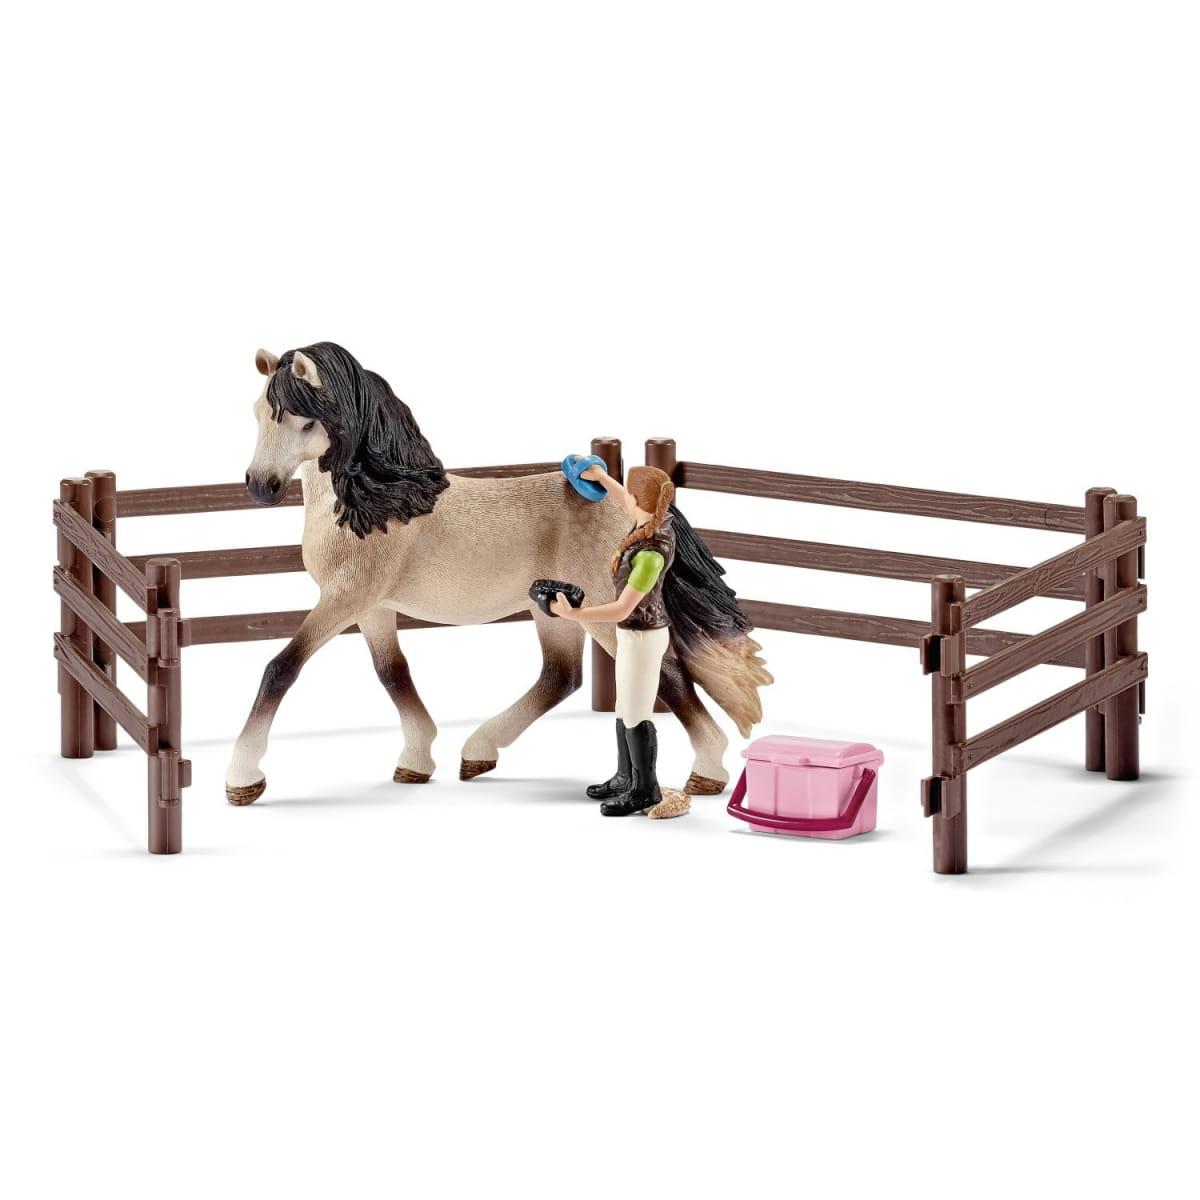 Набор Schleich 42270 для ухода за лошадьми Андалузский